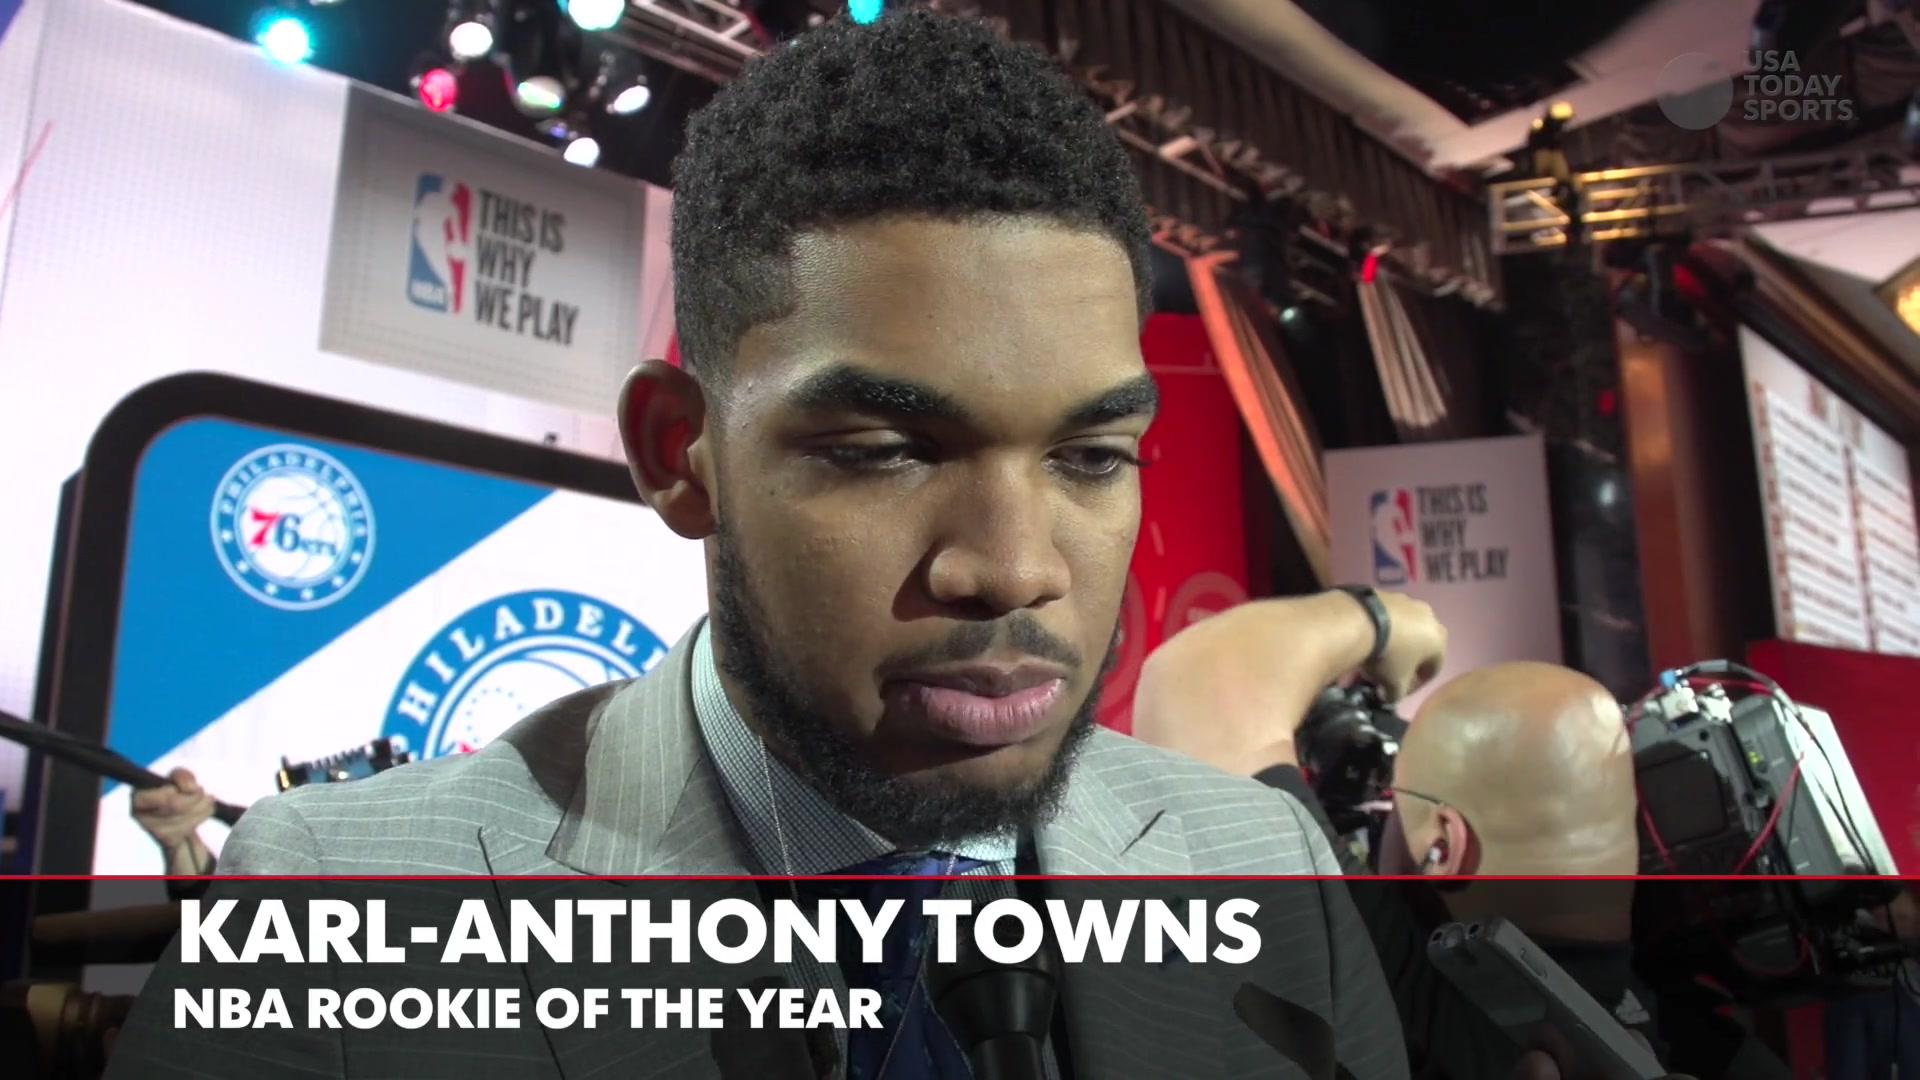 Towns Sees a Little Westbrook in HS Teammate Baldwin